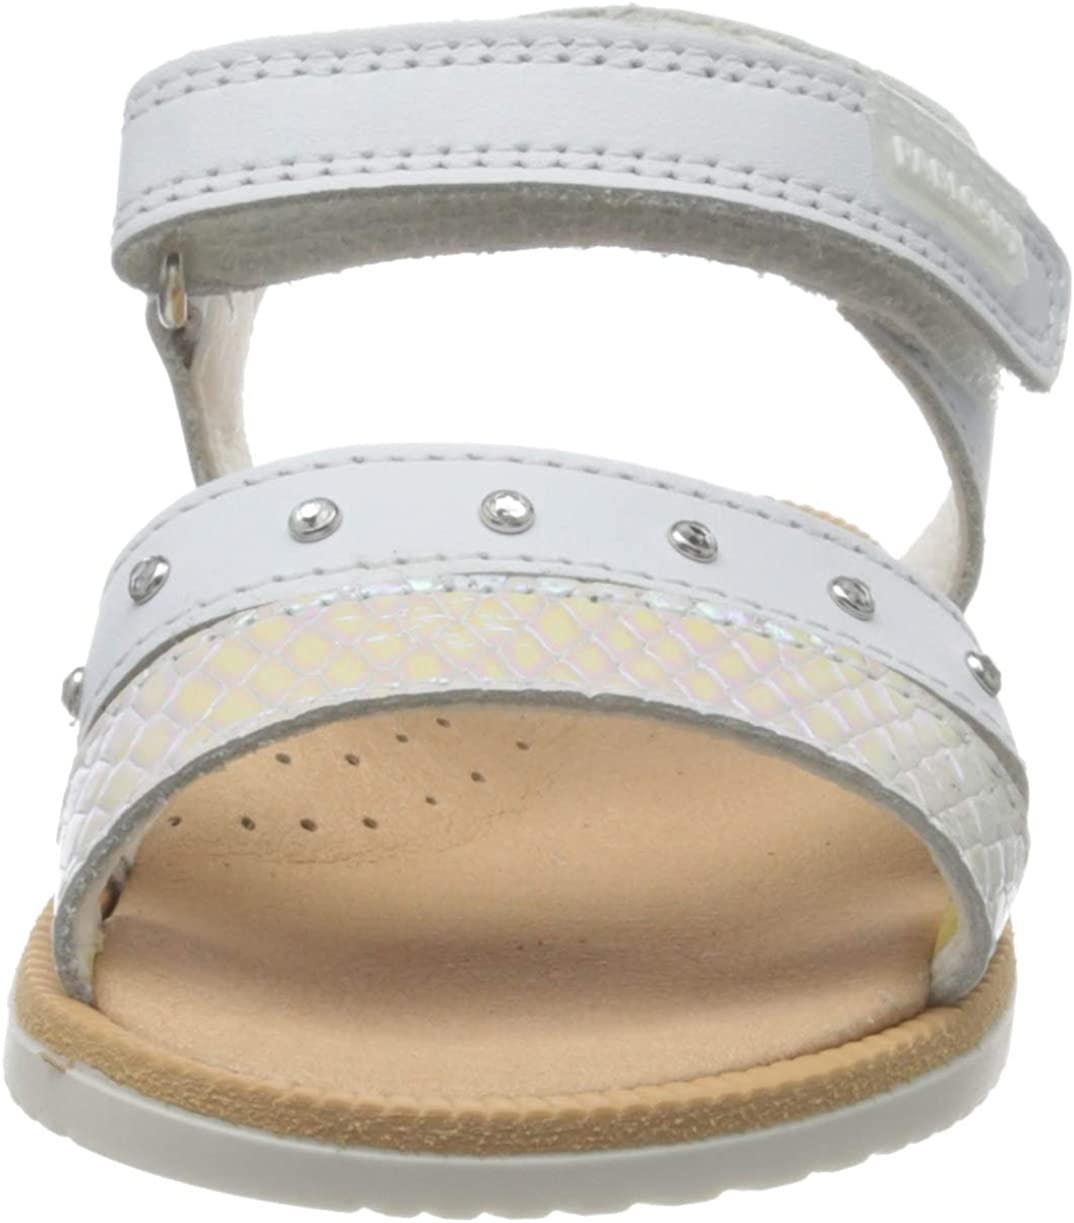 Sandalias para Beb/és Pablosky 075400